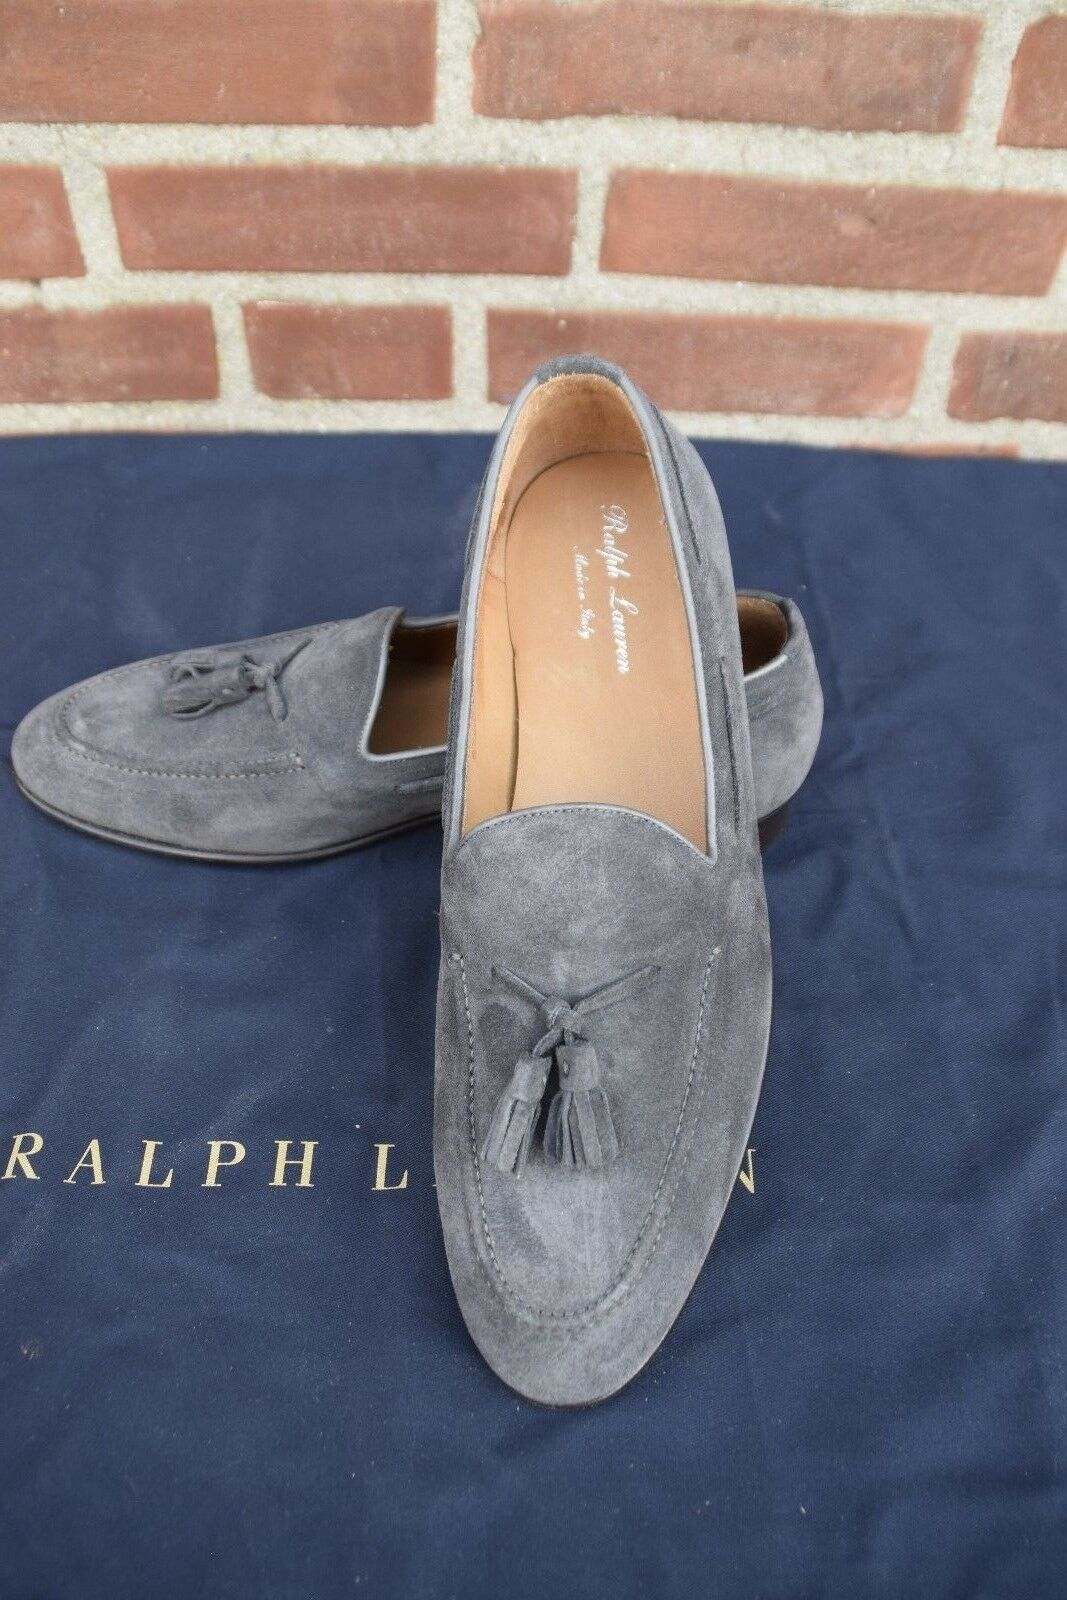 Ralph Lauren Purple Label Men's Italian Tassel Chessington Suede Loafer Charcoal